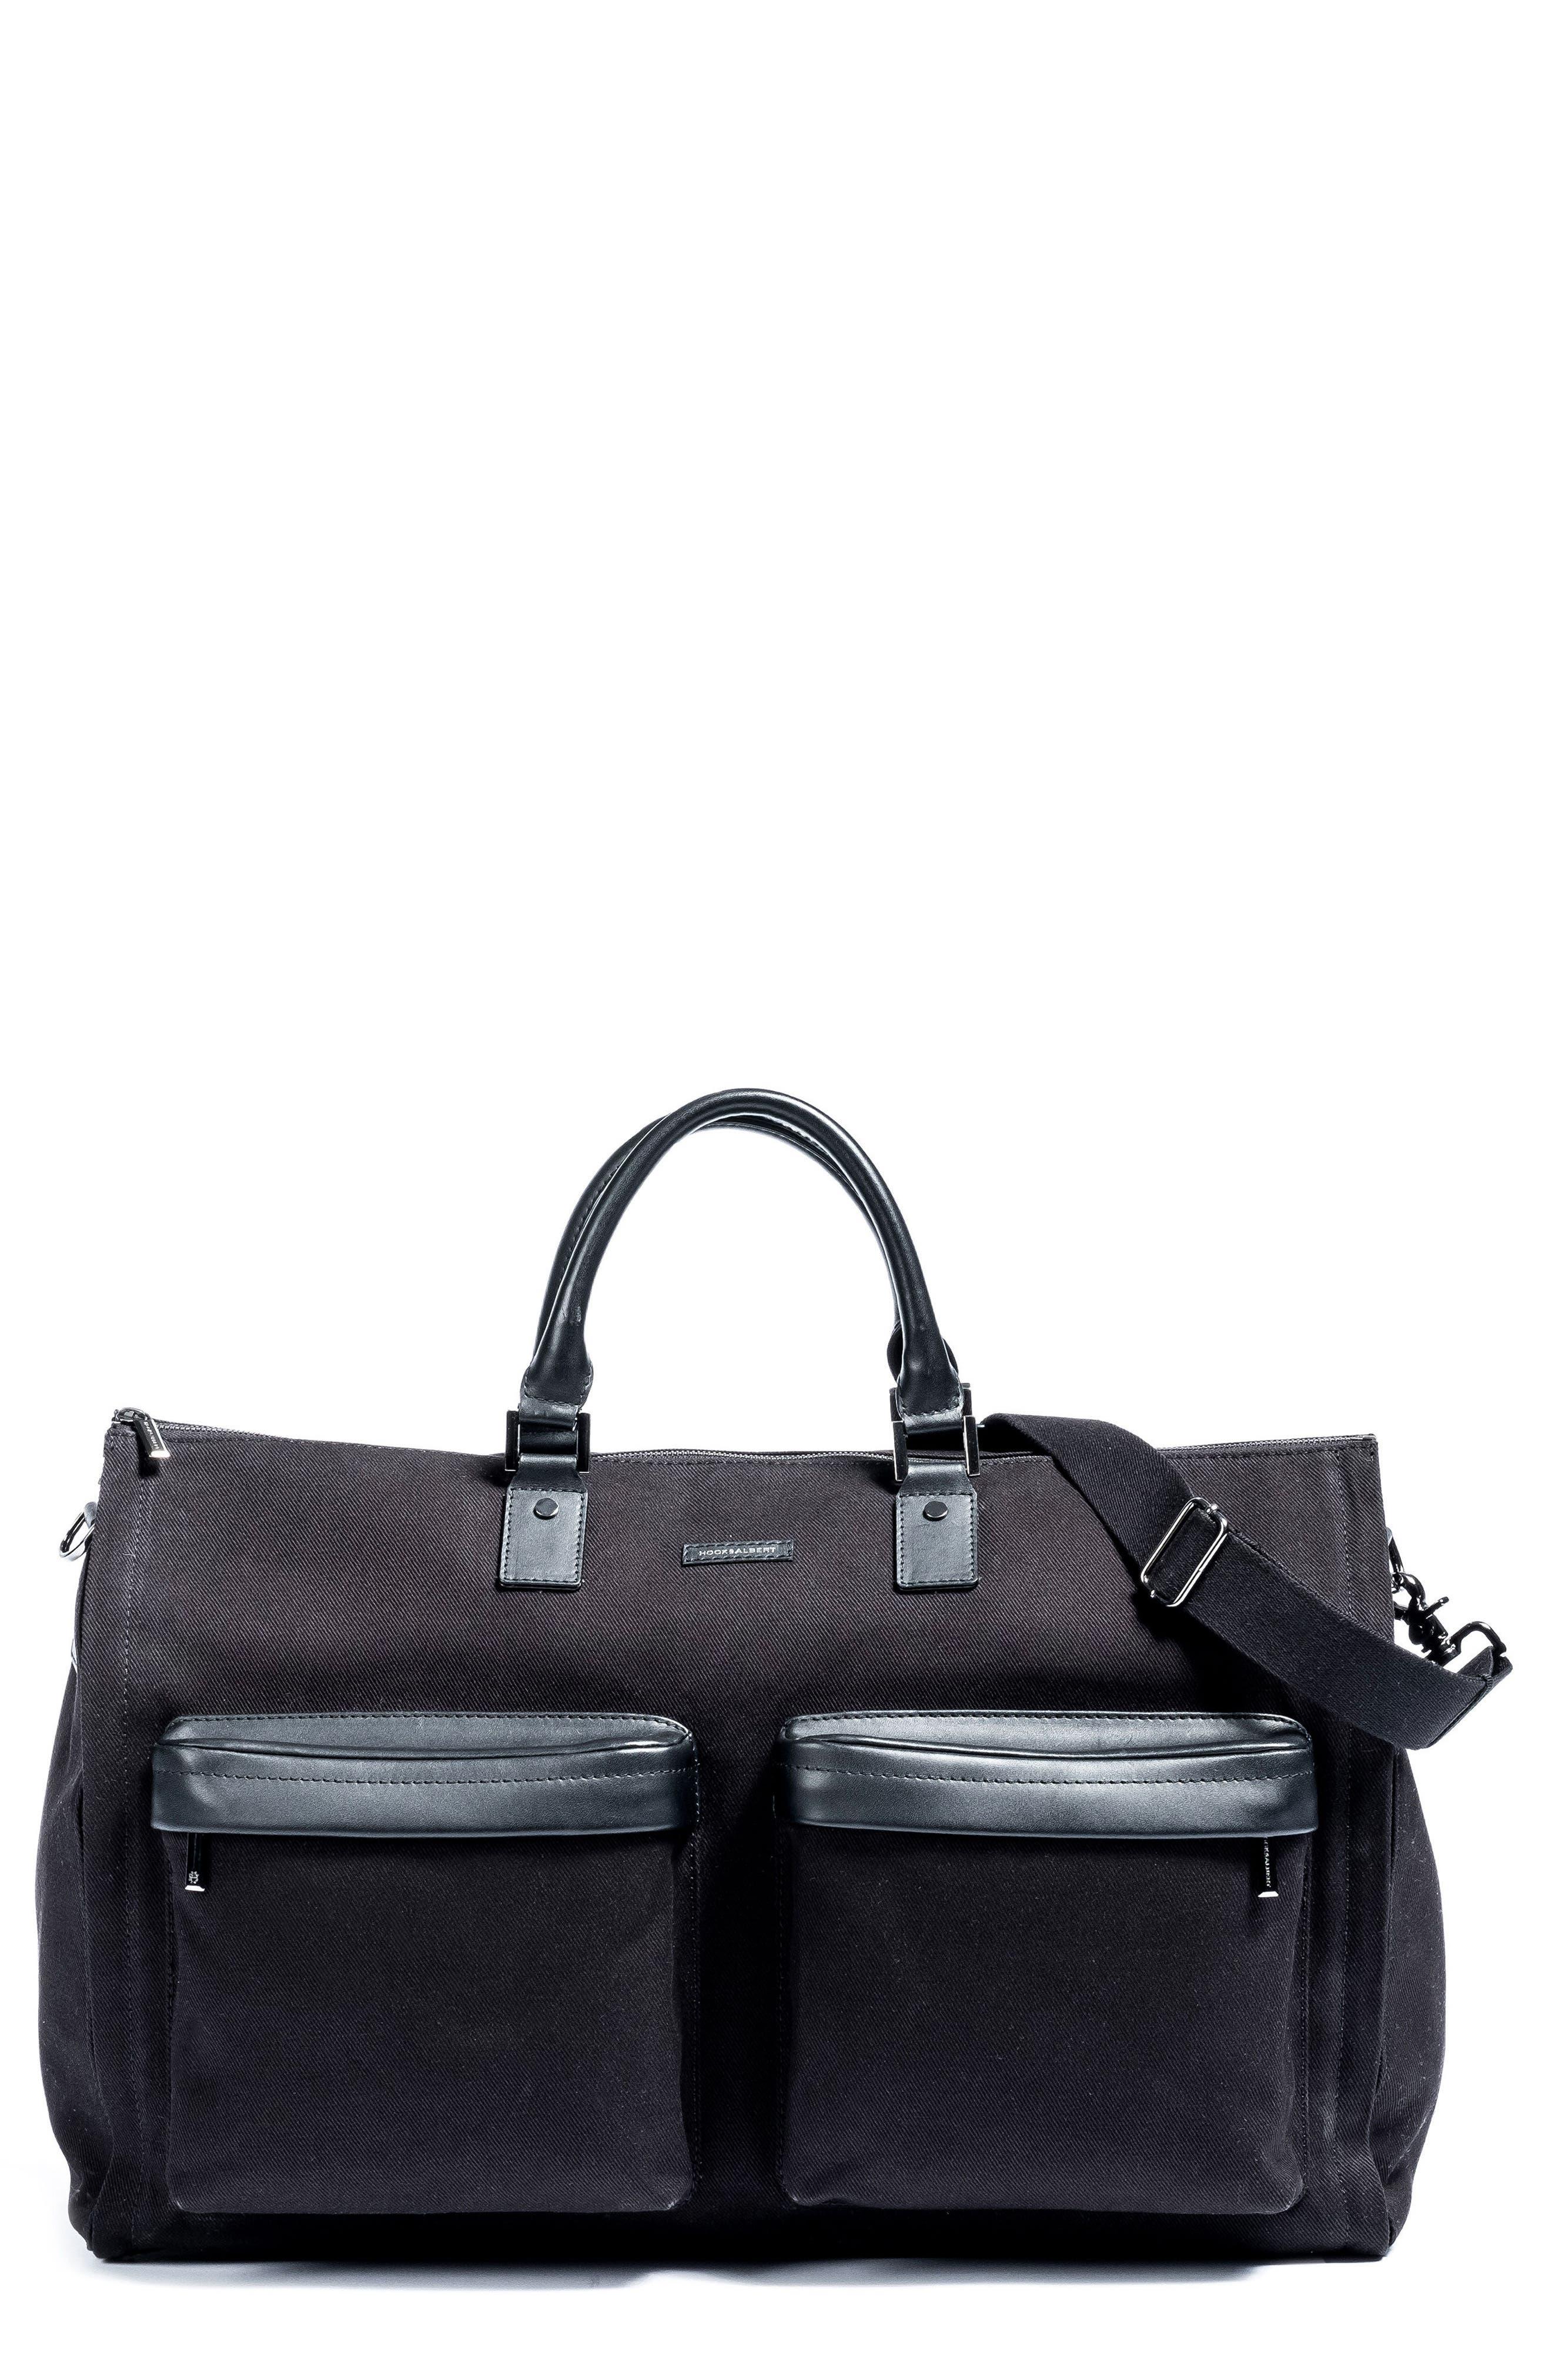 Twill Duffel Bag,                         Main,                         color, BLACK